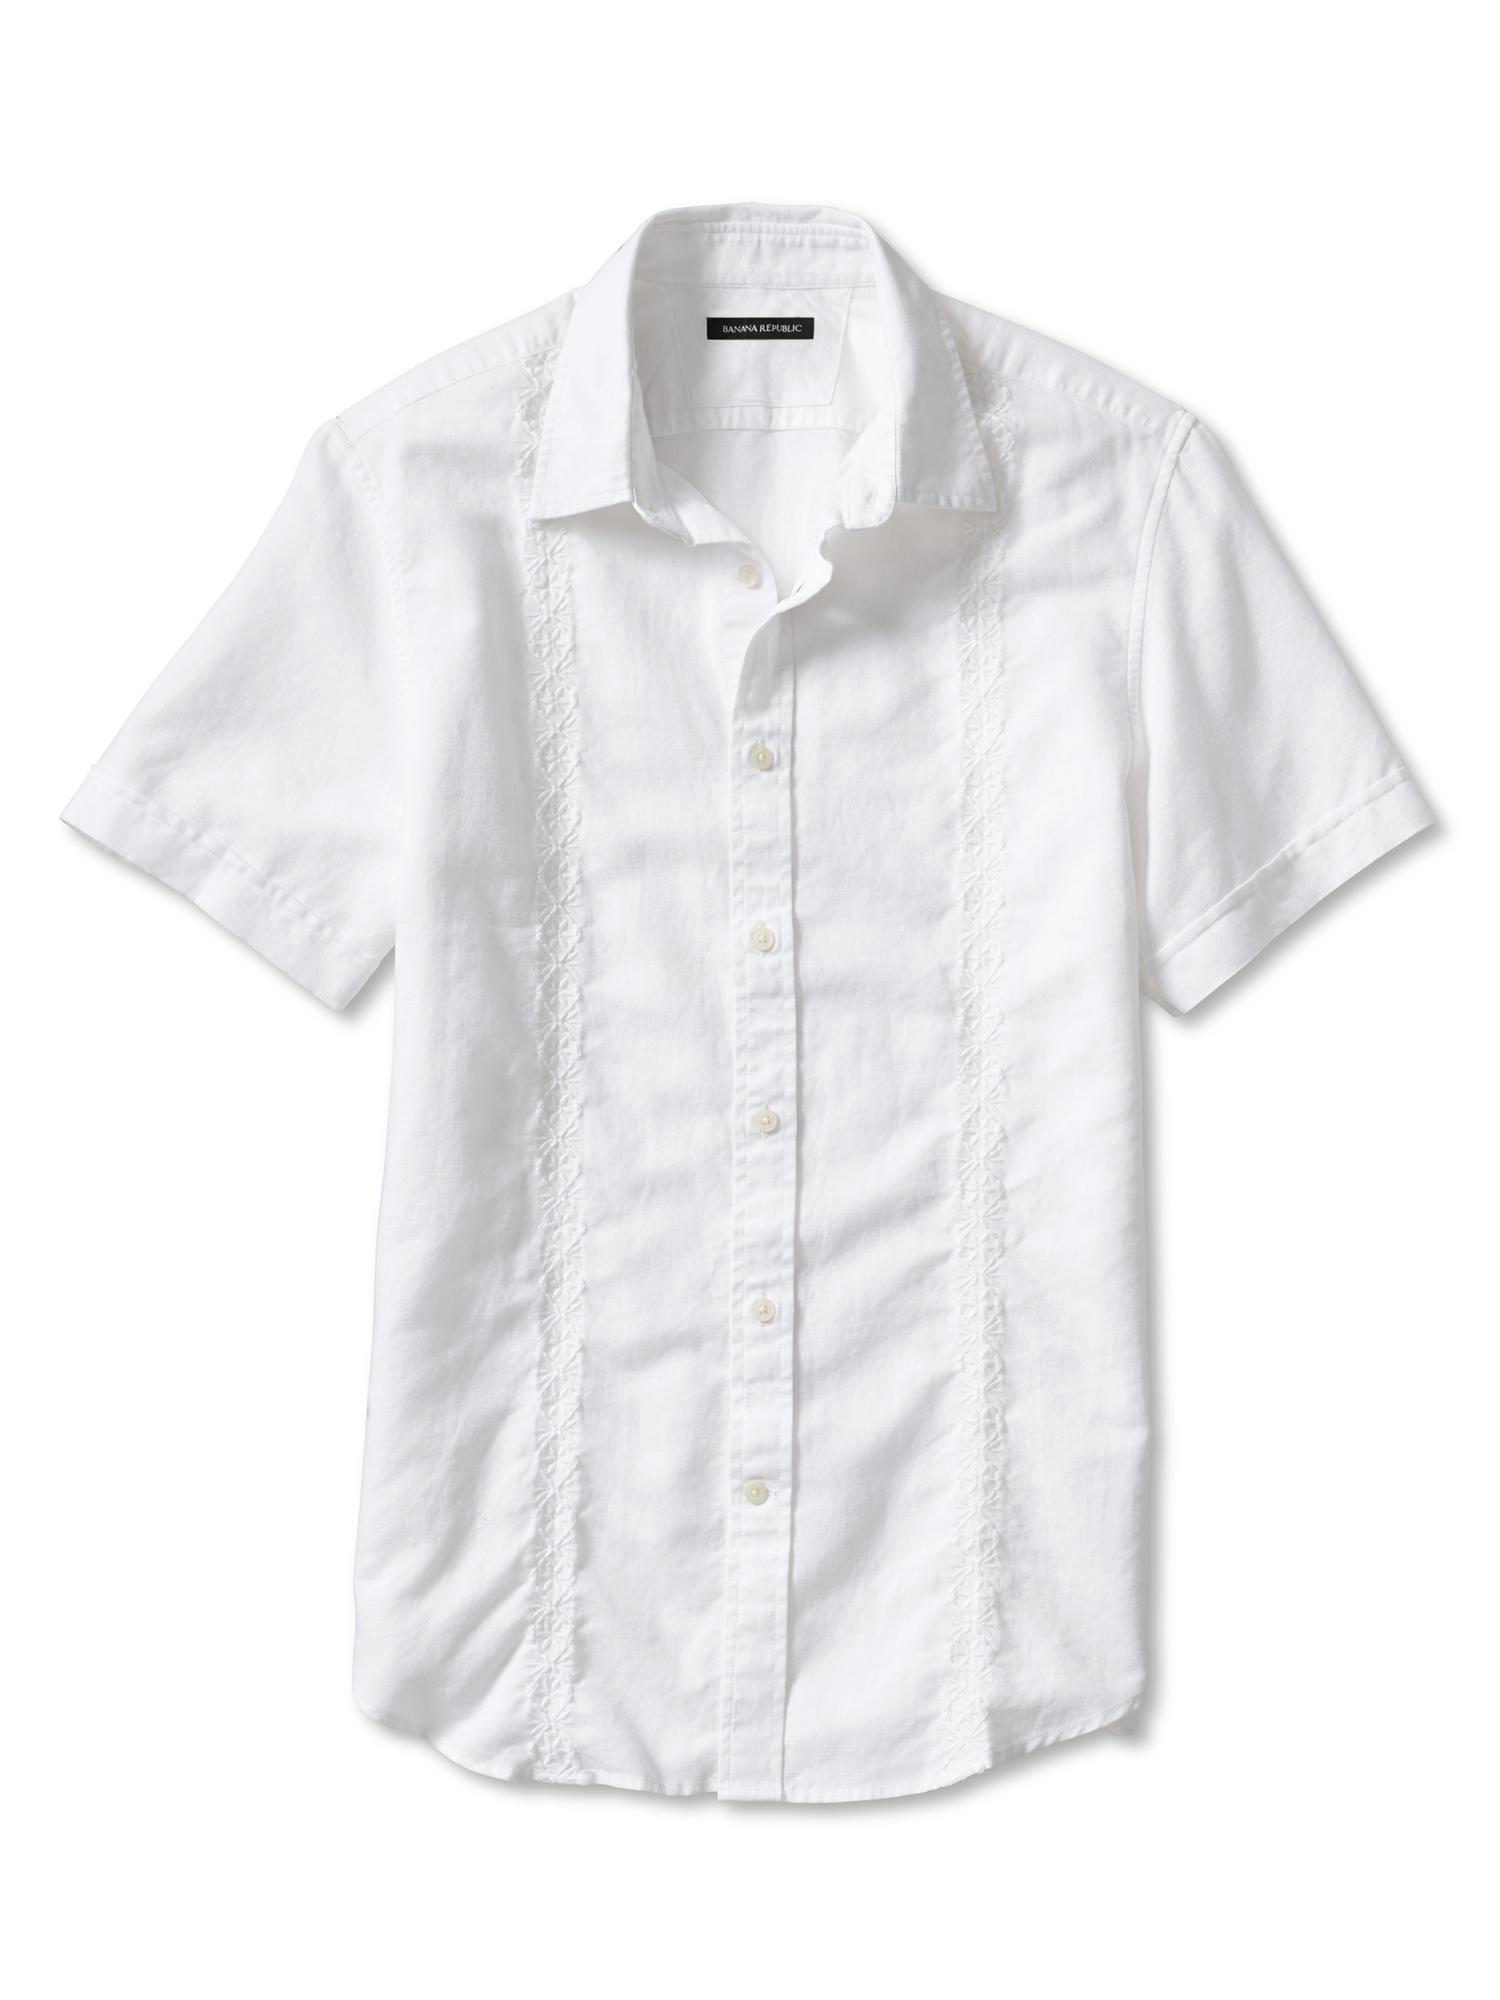 Banana republic slim fit embroidered white linen cotton for Banana republic torino